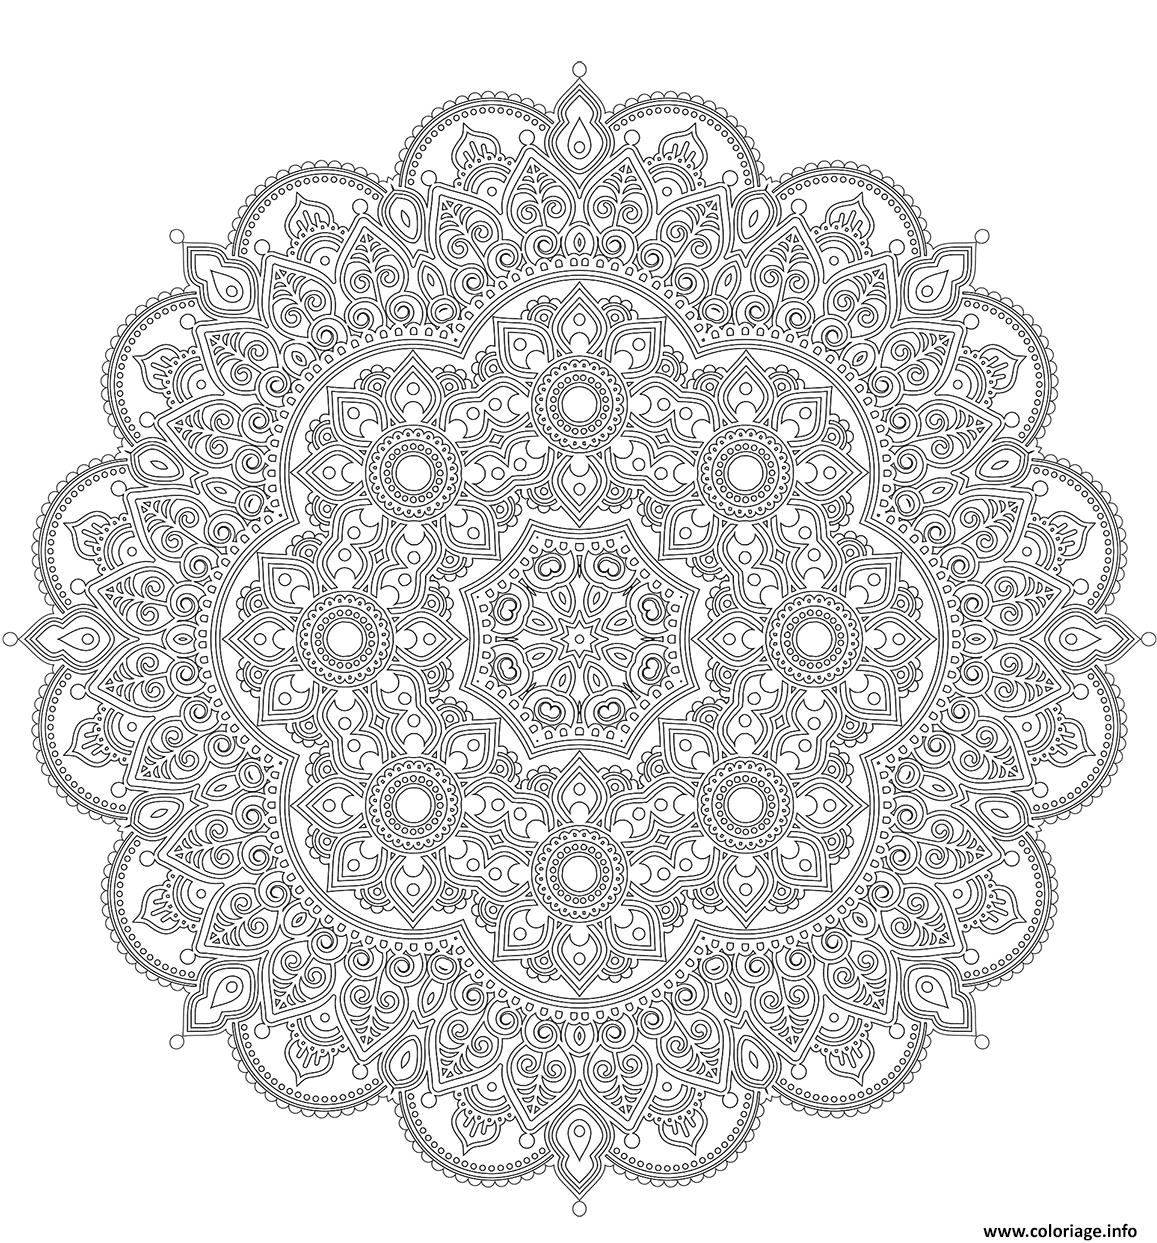 Coloriage Mandala Difficile Style Oriental Dessin concernant Coloriage De Mandala Difficile A Imprimer